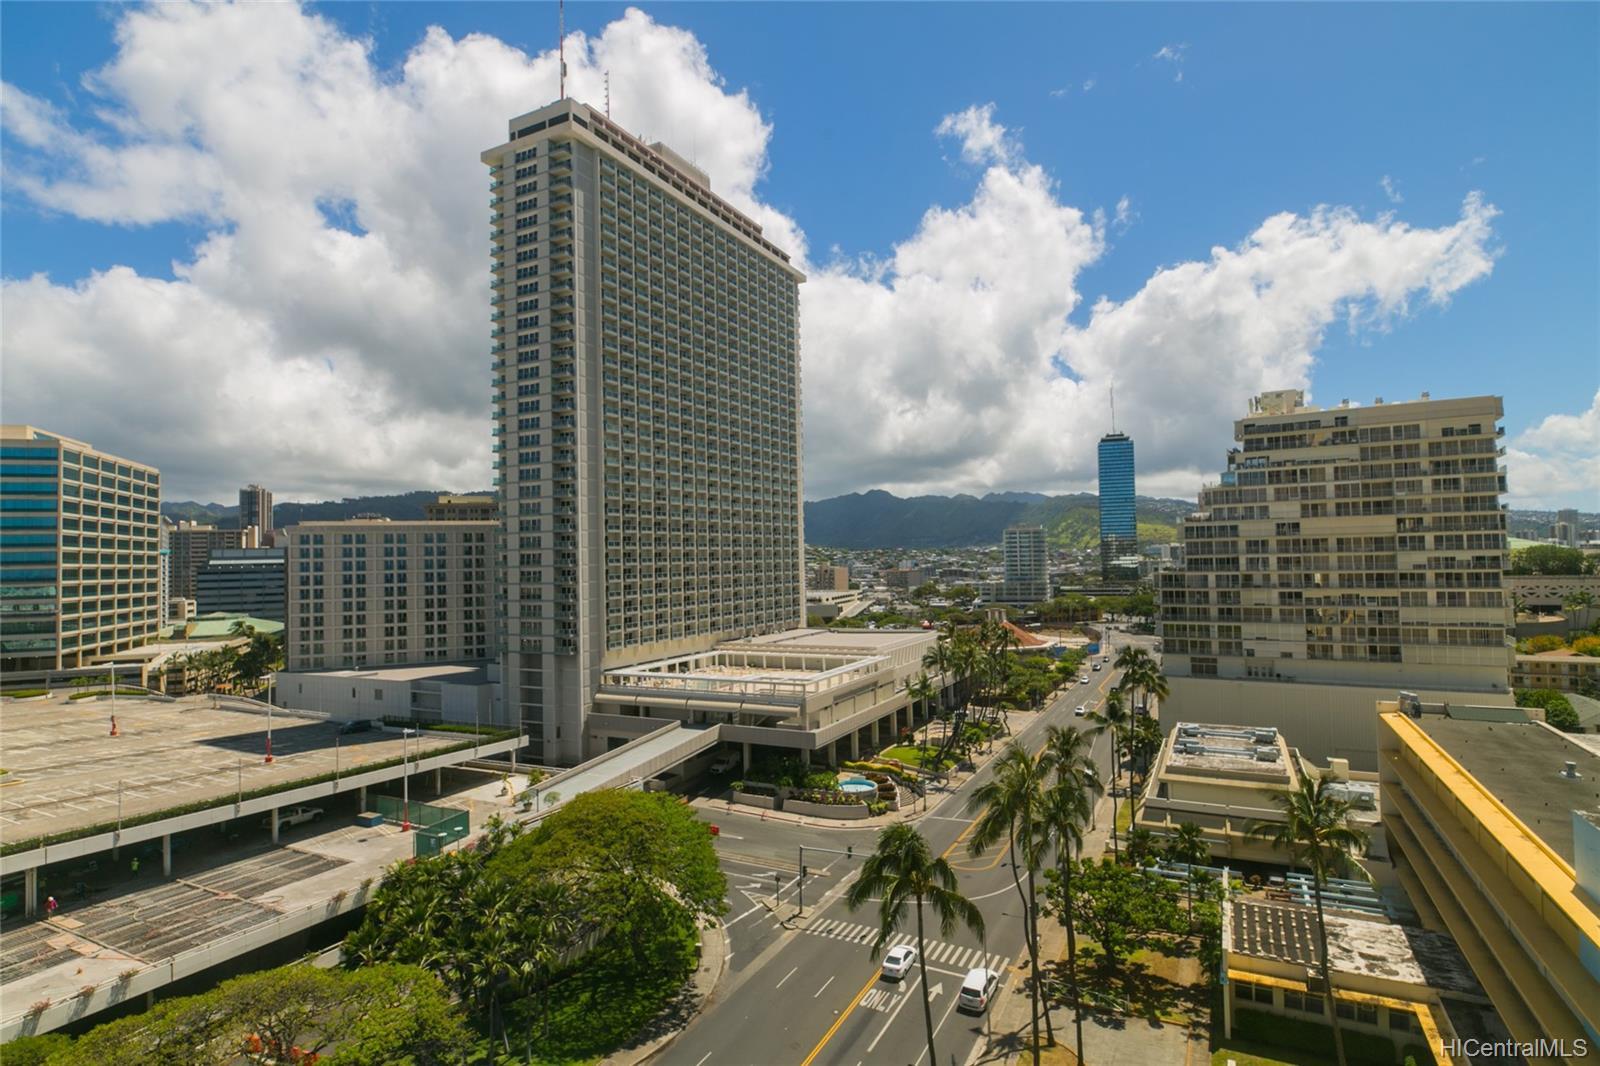 1600 Ala Moana Blvd Honolulu - Rental - photo 25 of 25